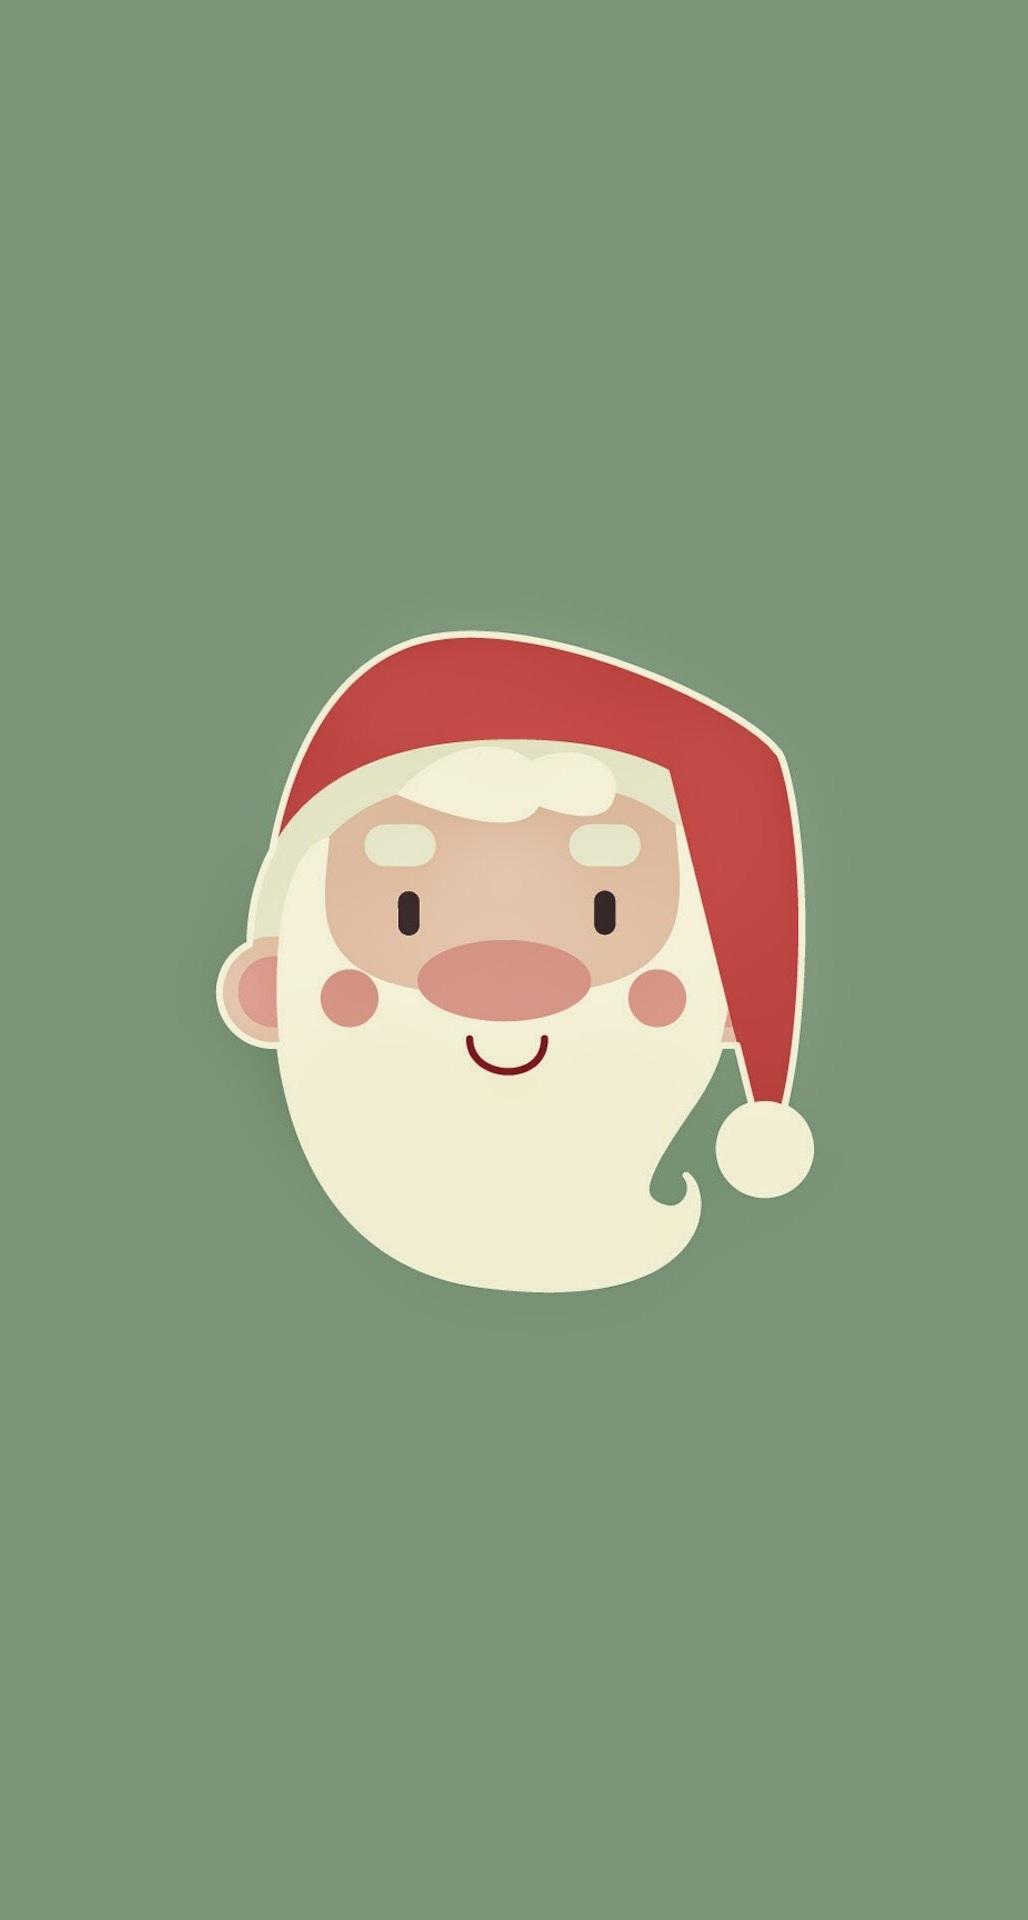 cute santa claus minimal illustration wallpaper for iphone